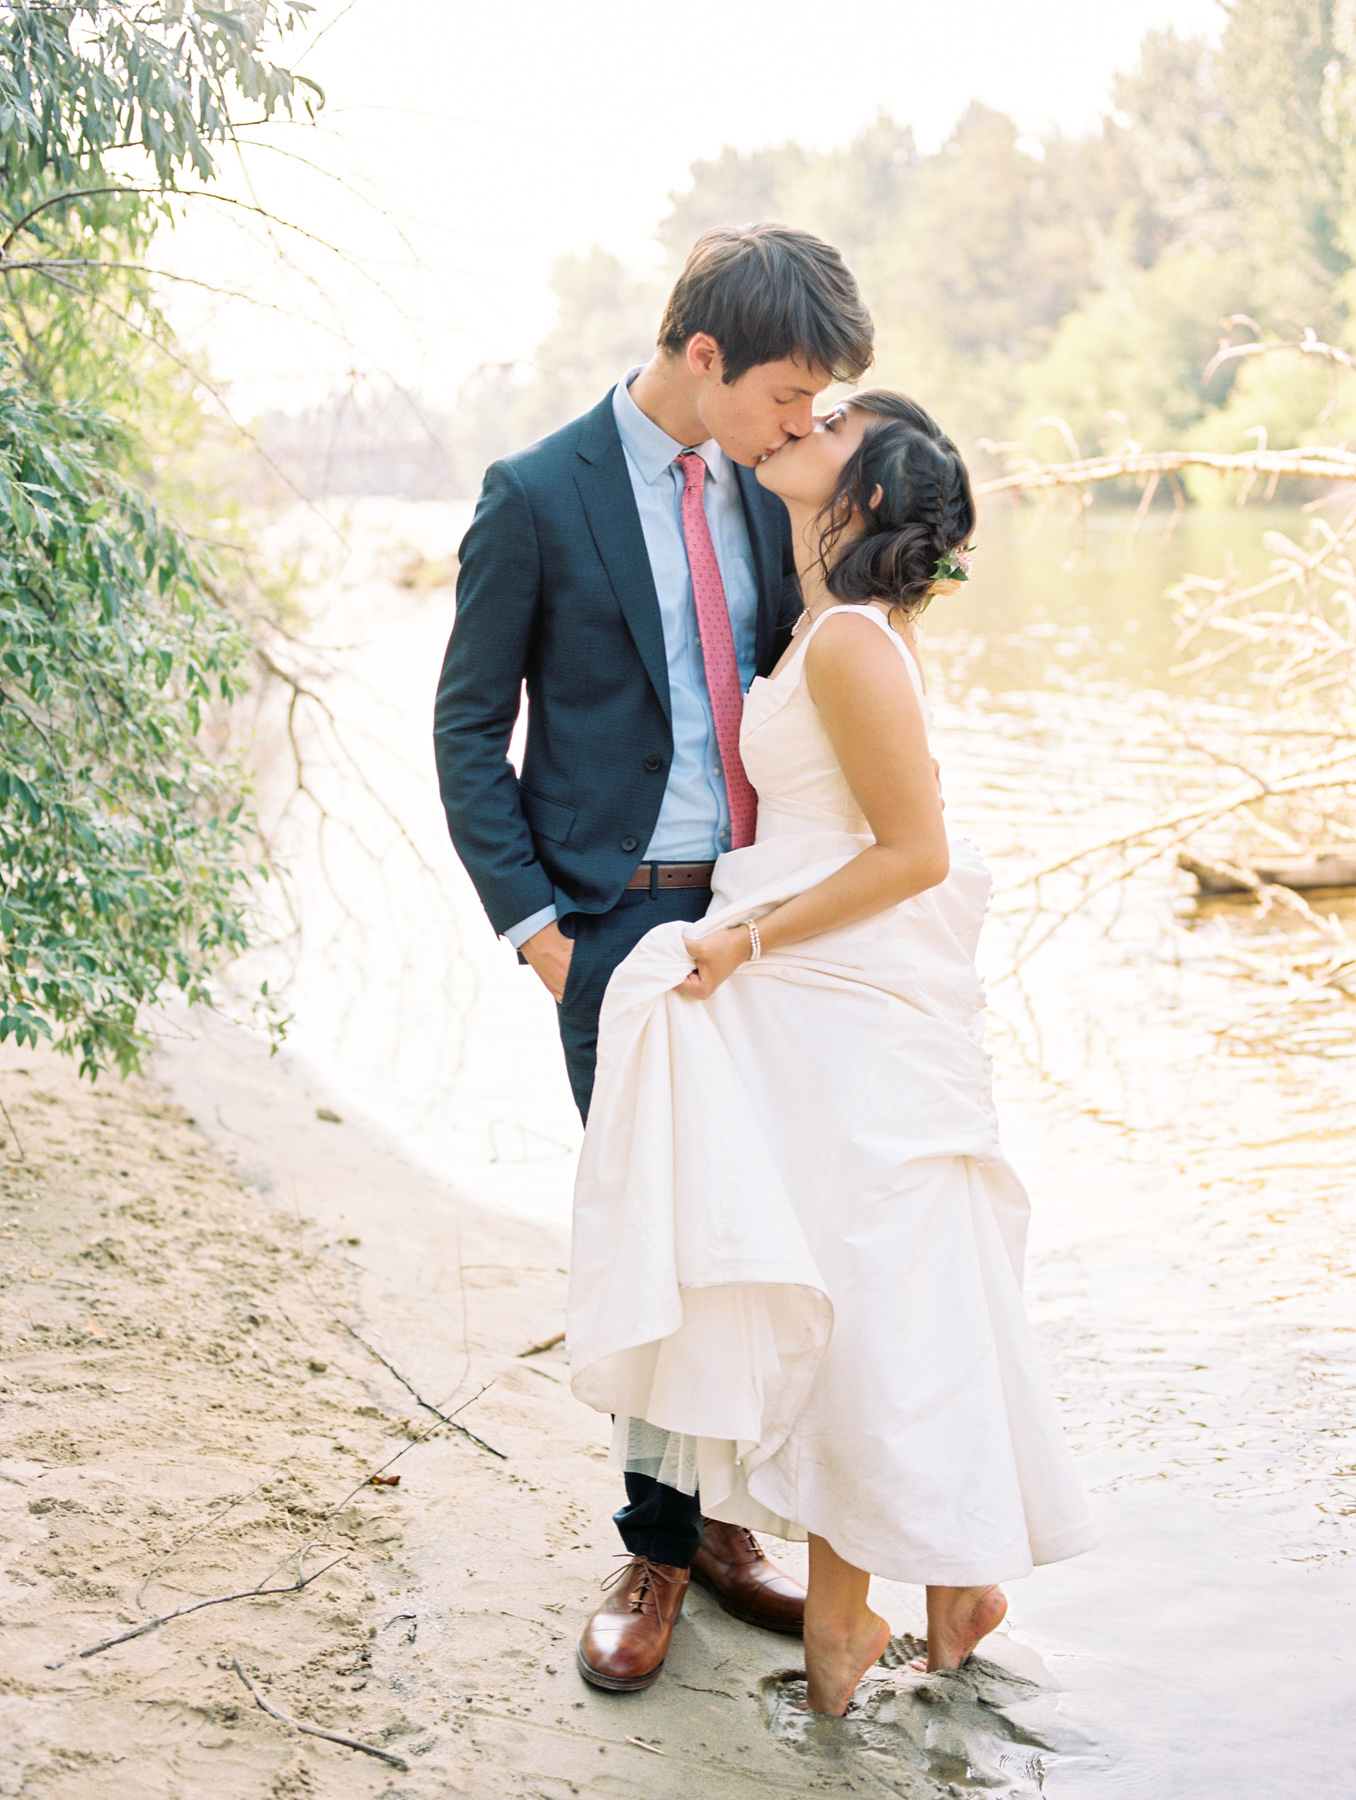 Ben+Joella_Marriage_61.jpg